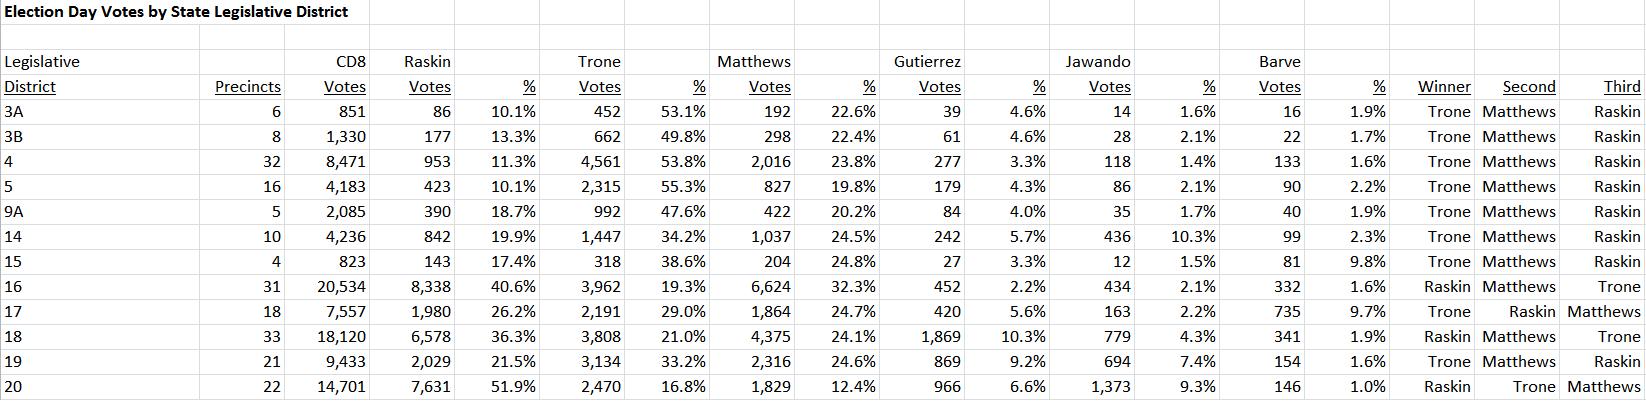 CD8 Votes by State Legislative District 2